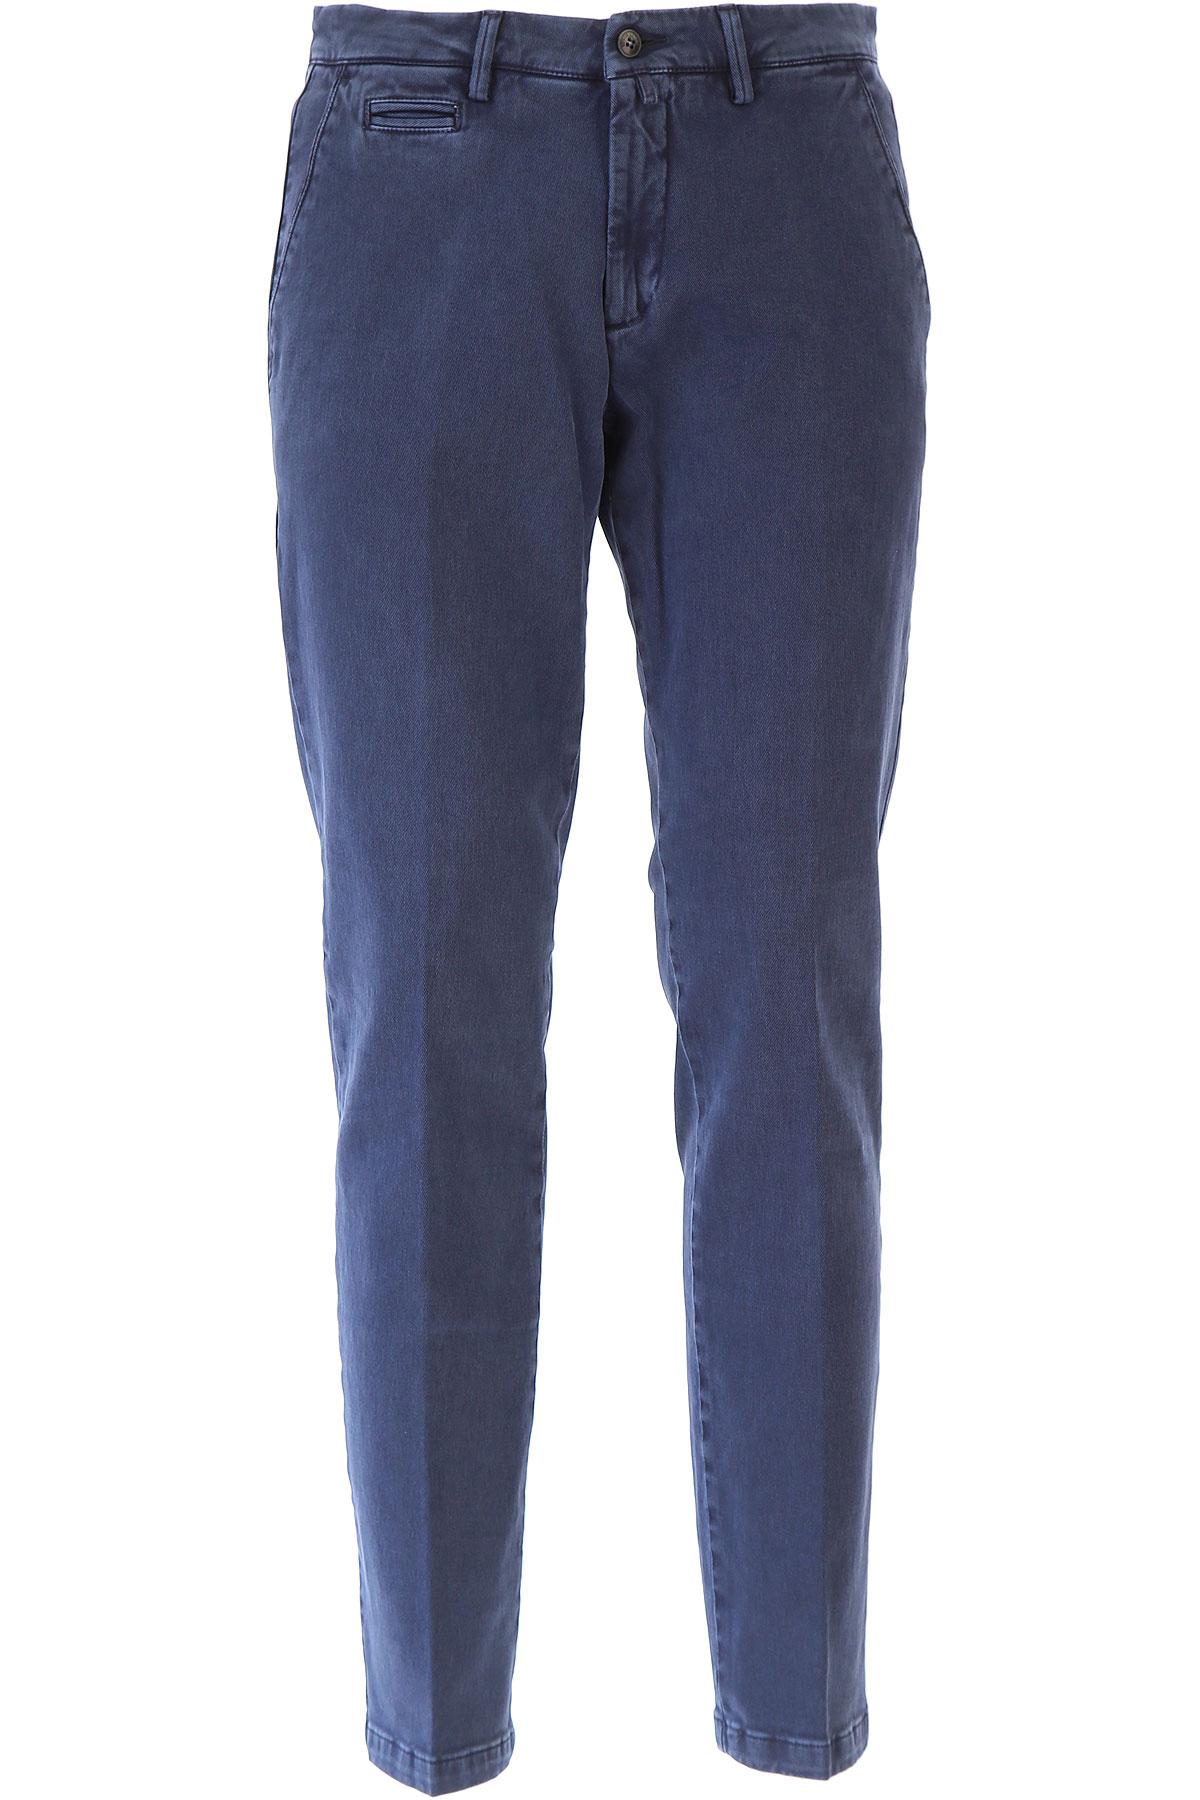 Image of Briglia Pants for Men, Washed Blue, Cotton, 2017, US 34 - EU 48 US 36 - EU 50